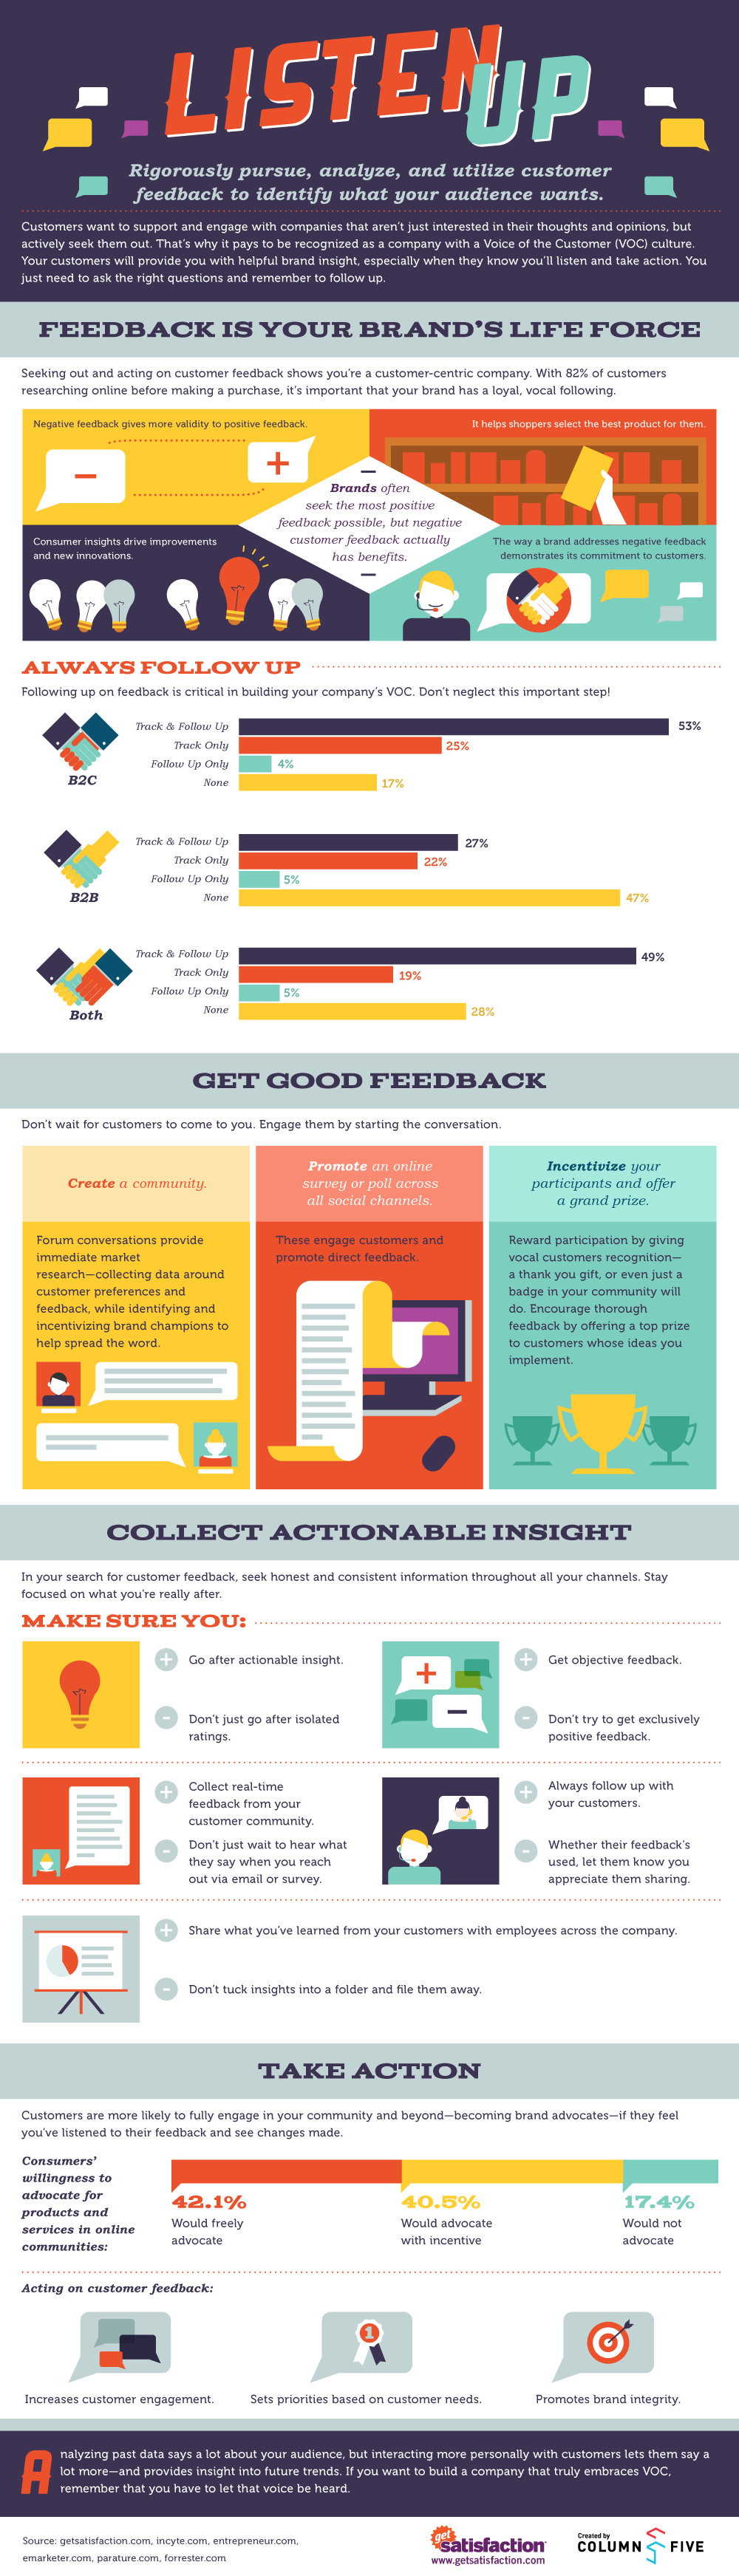 FEEDback-infographic